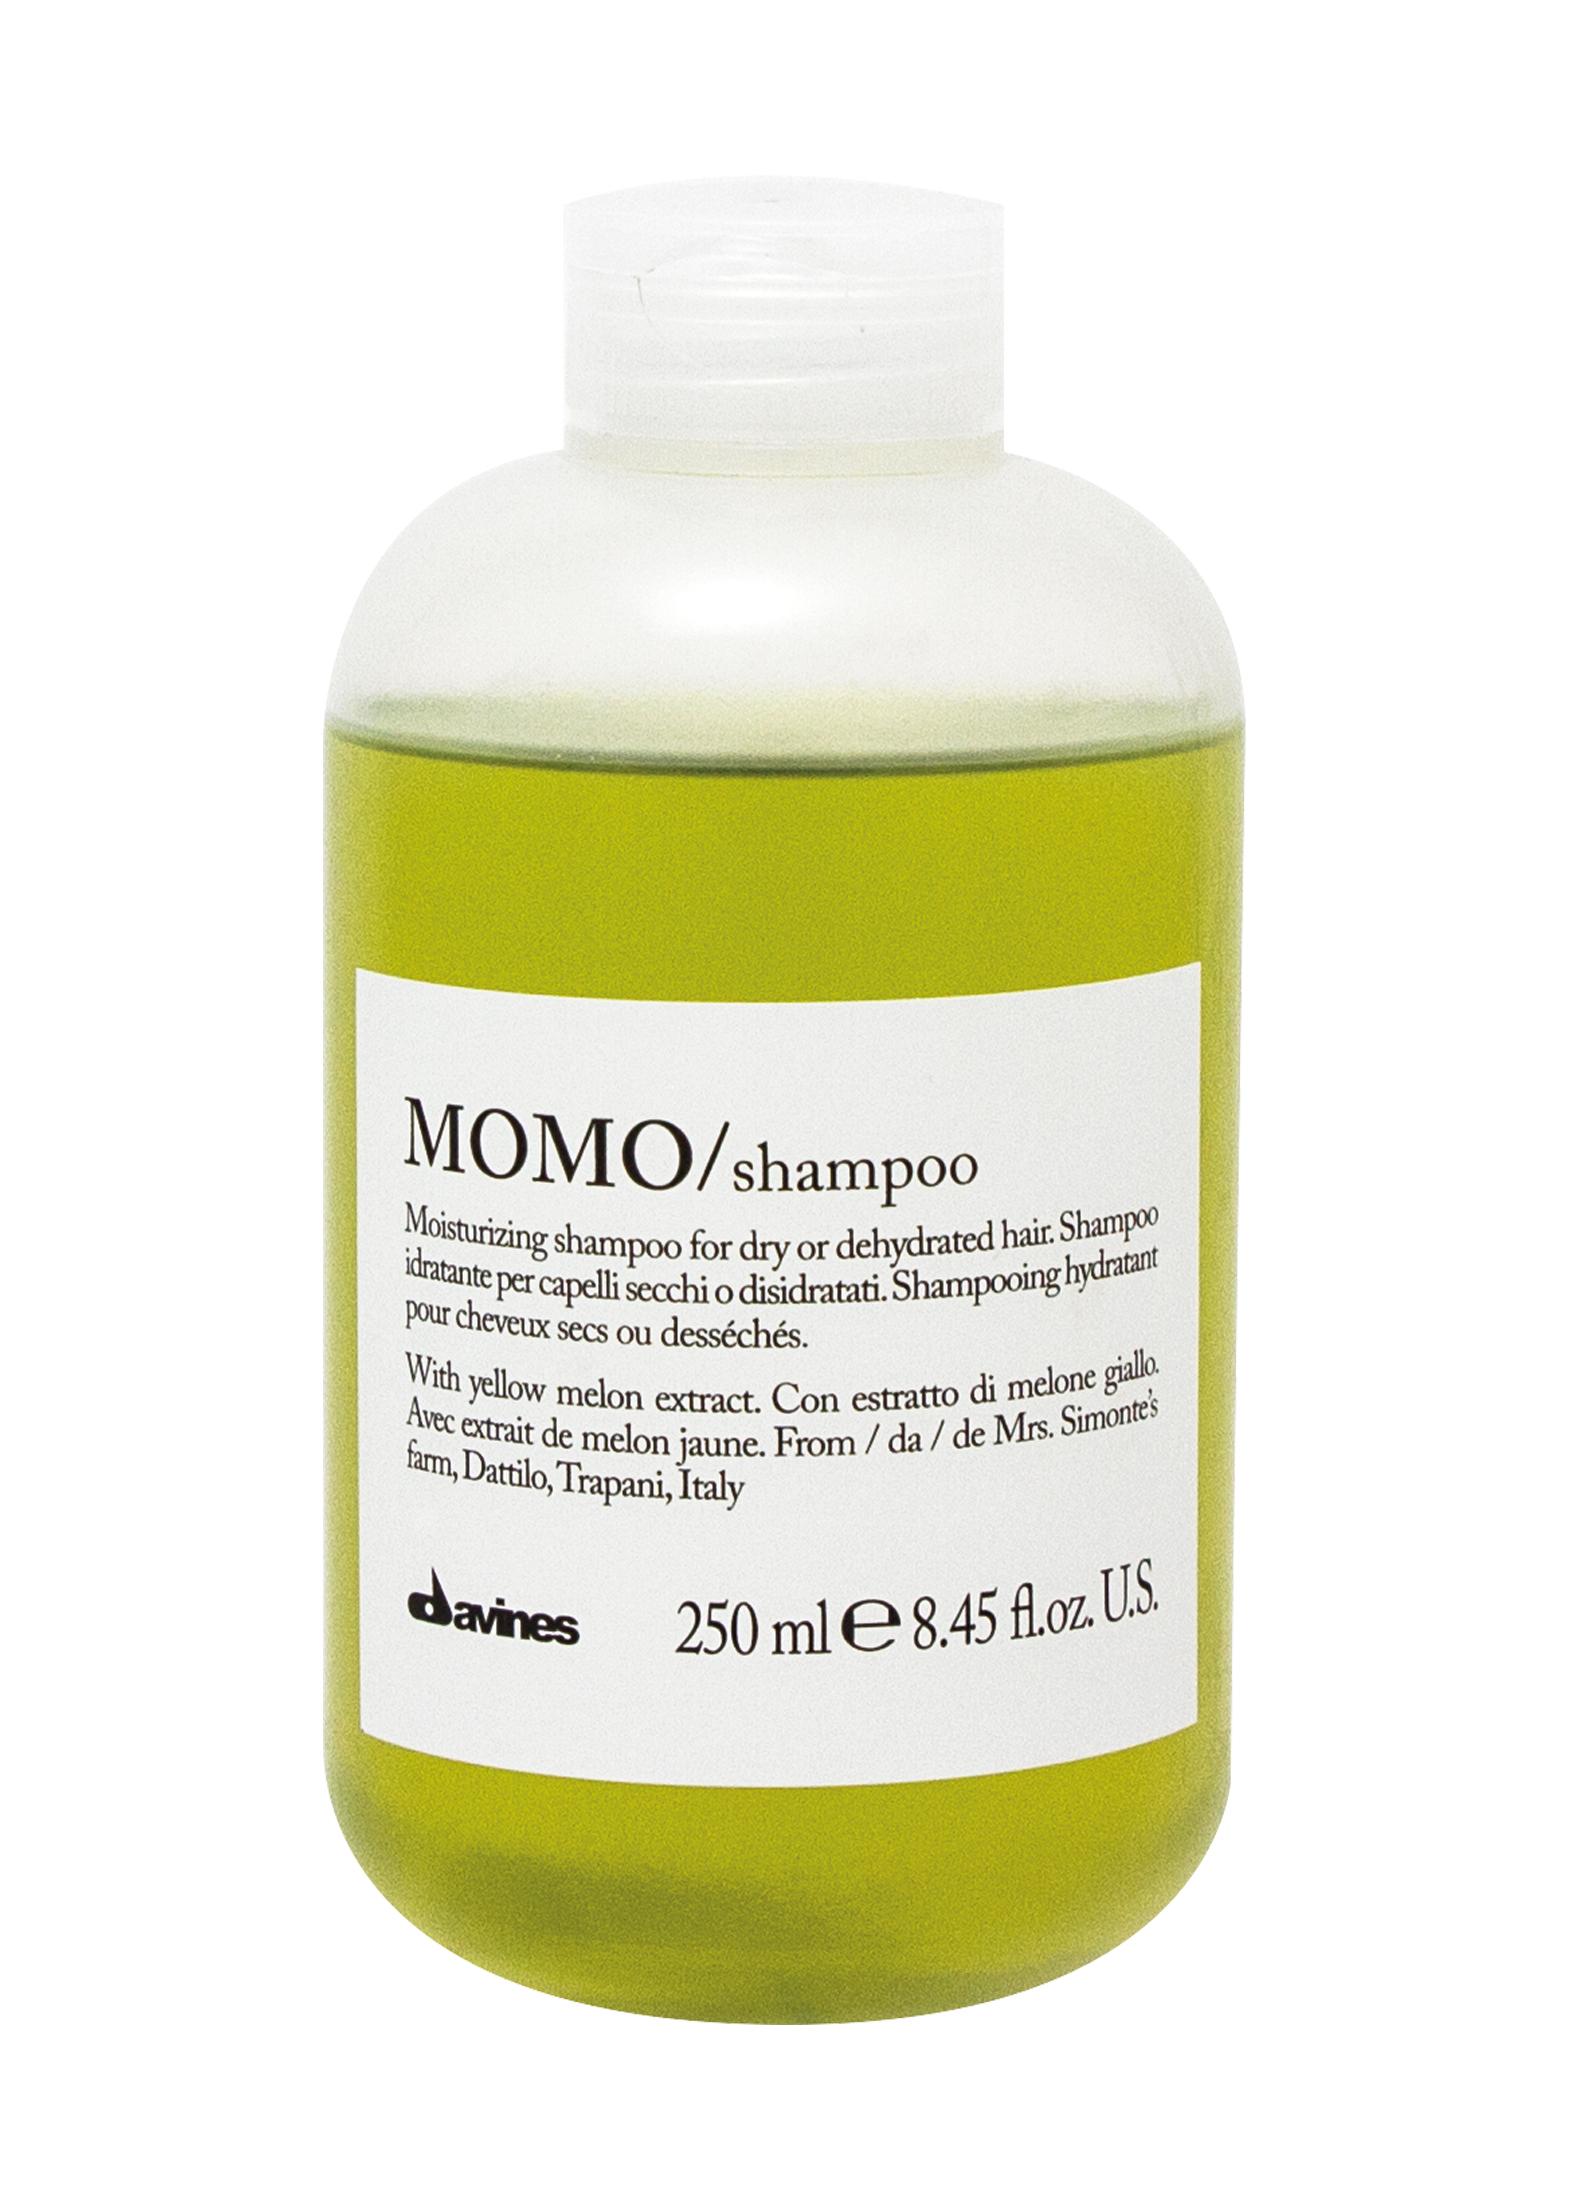 DEHC MOMO Shampoo 250ml image number 0